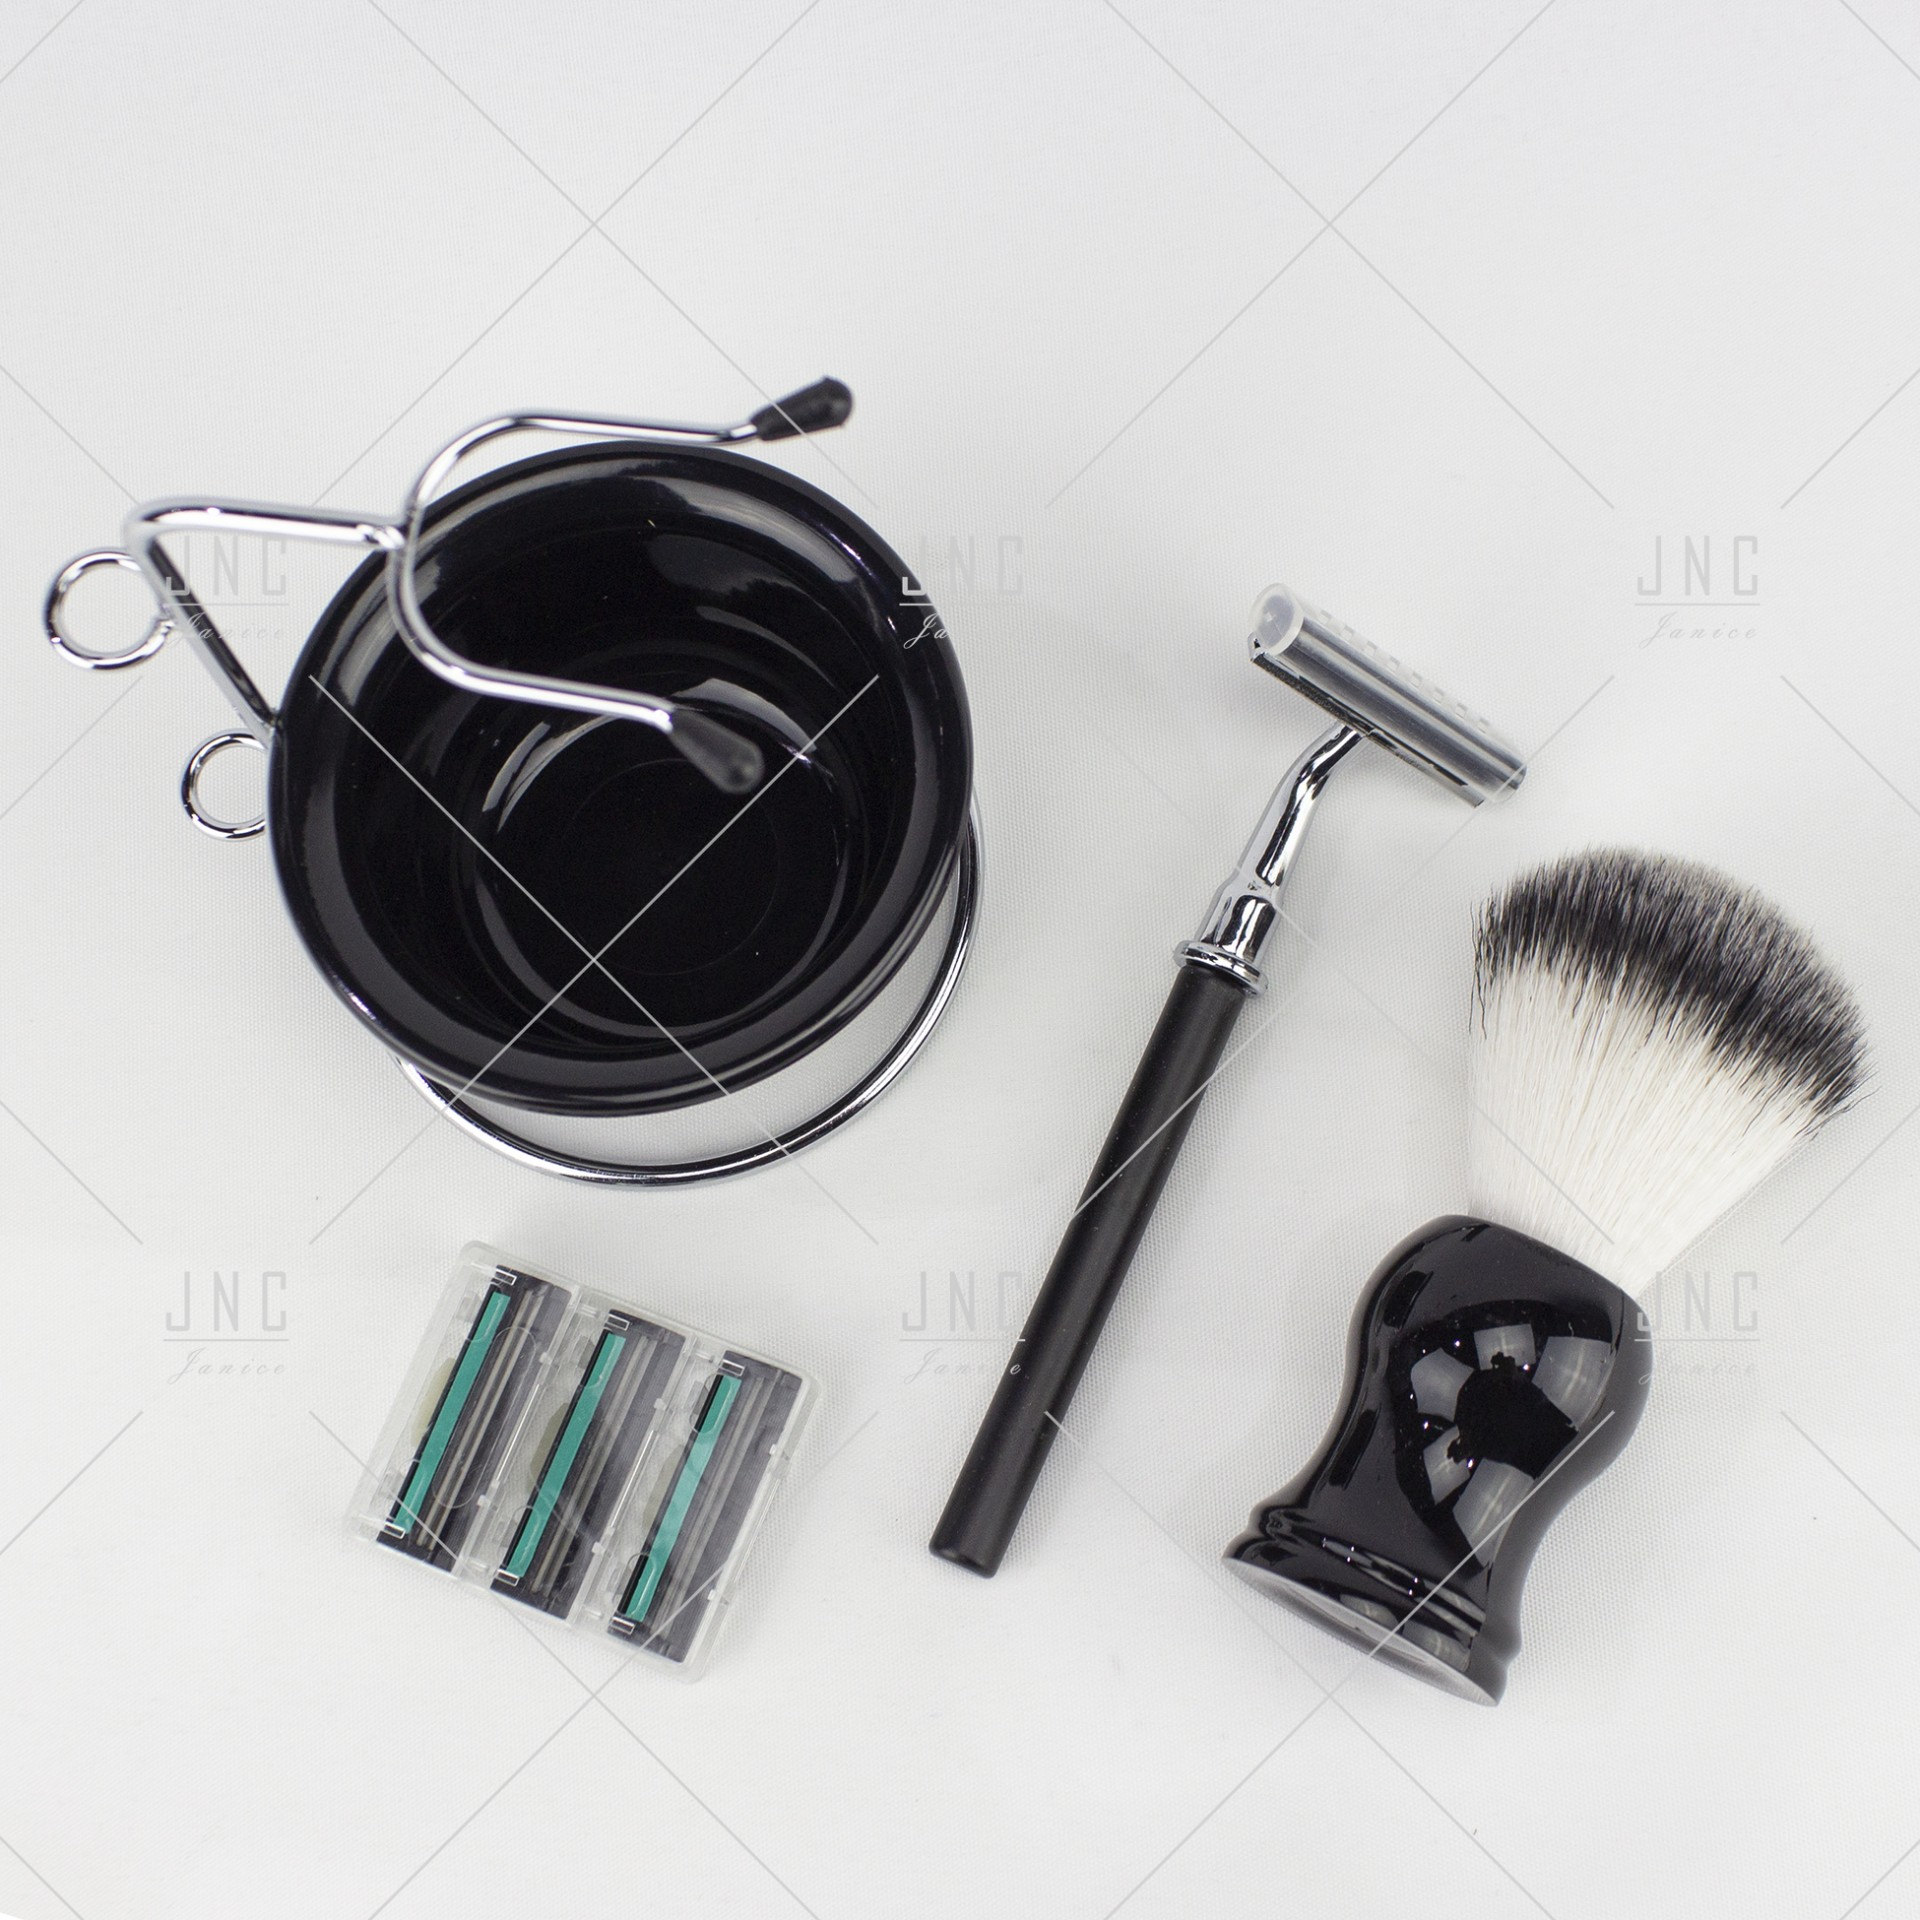 Kit Barbear | Ref.861989